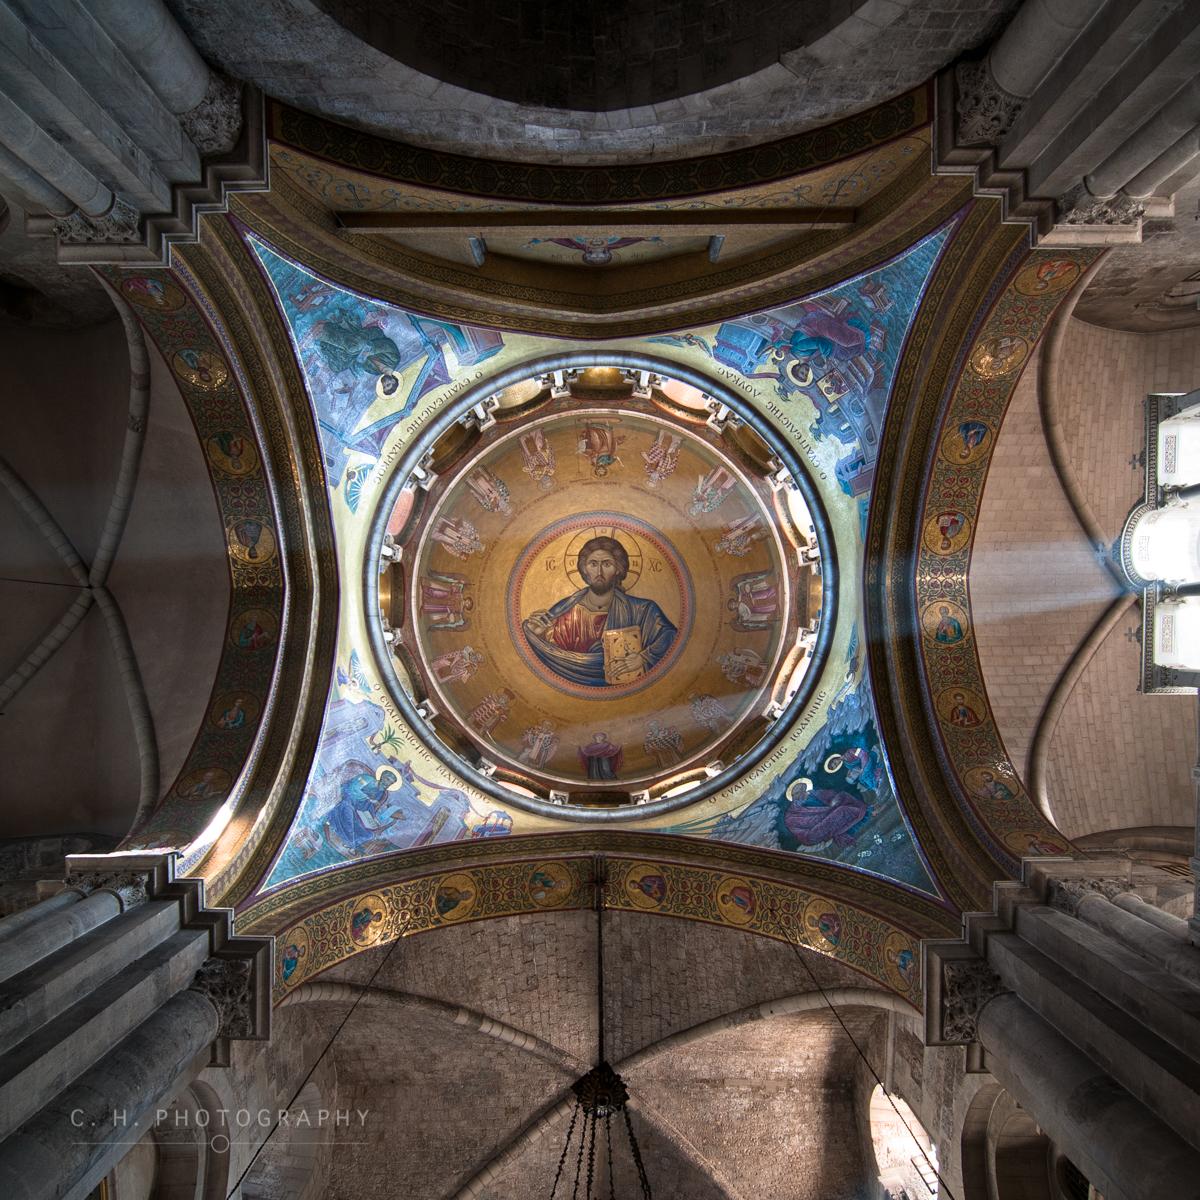 Church of The Holy Sepulchre - Jerusalem, Israel